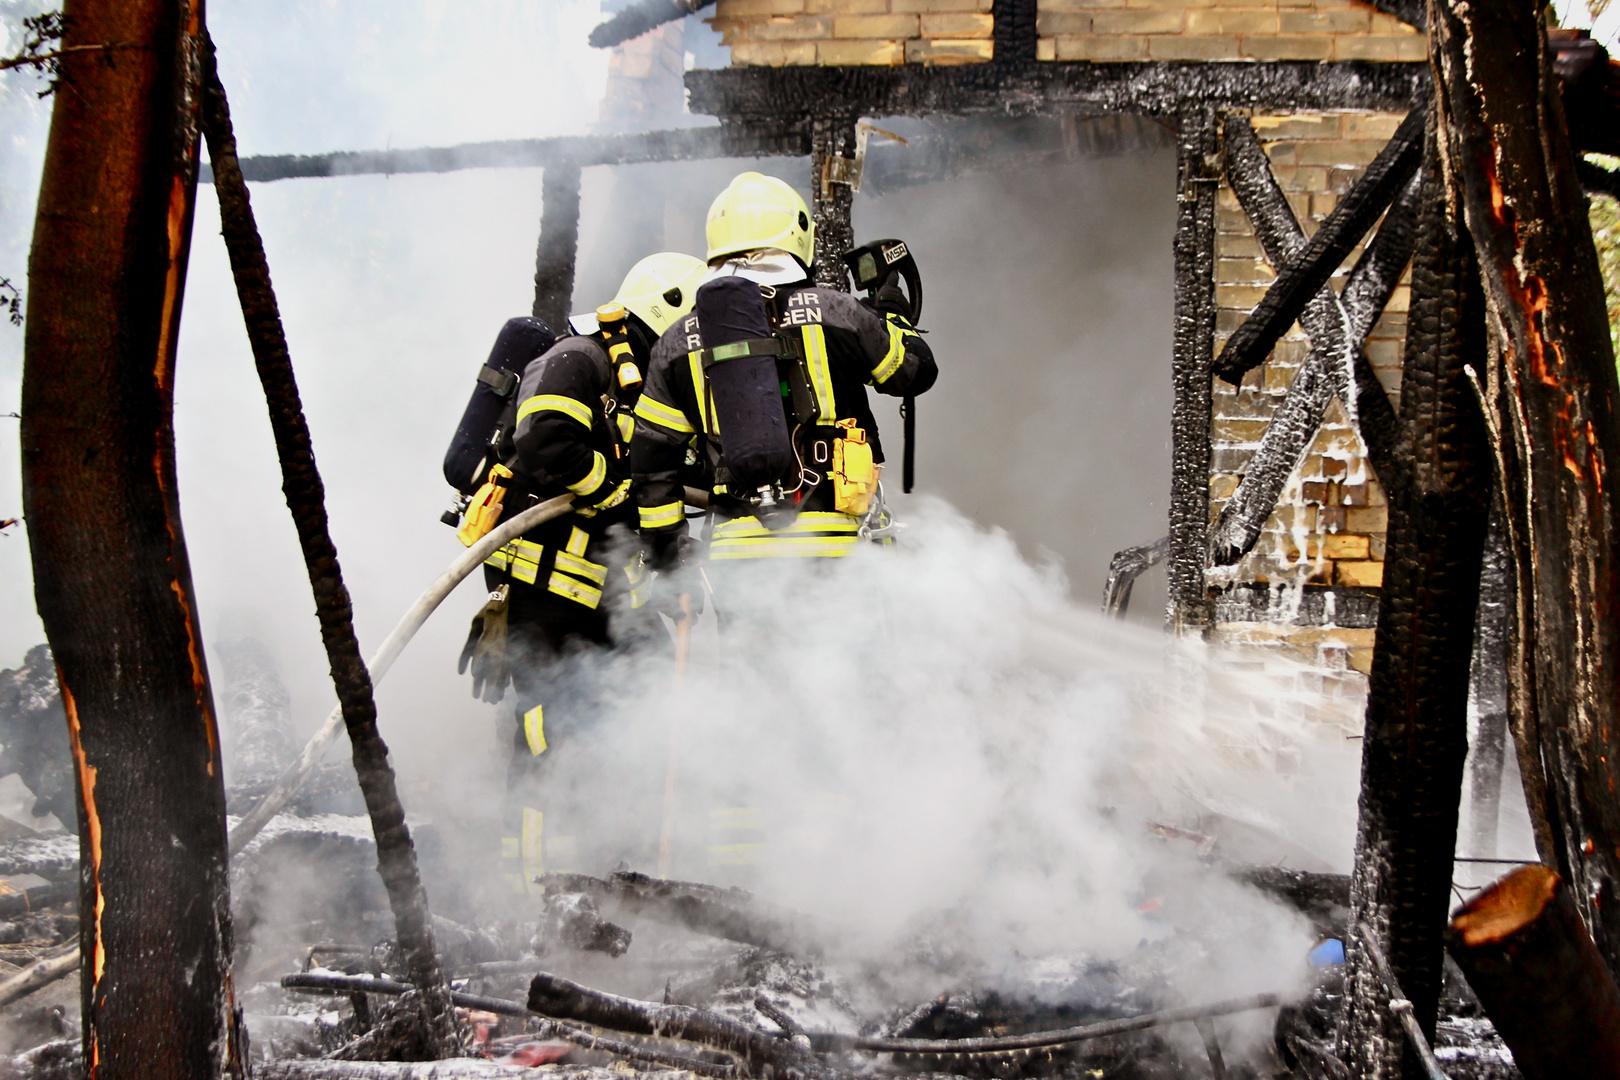 Angriffstrupp im Brand